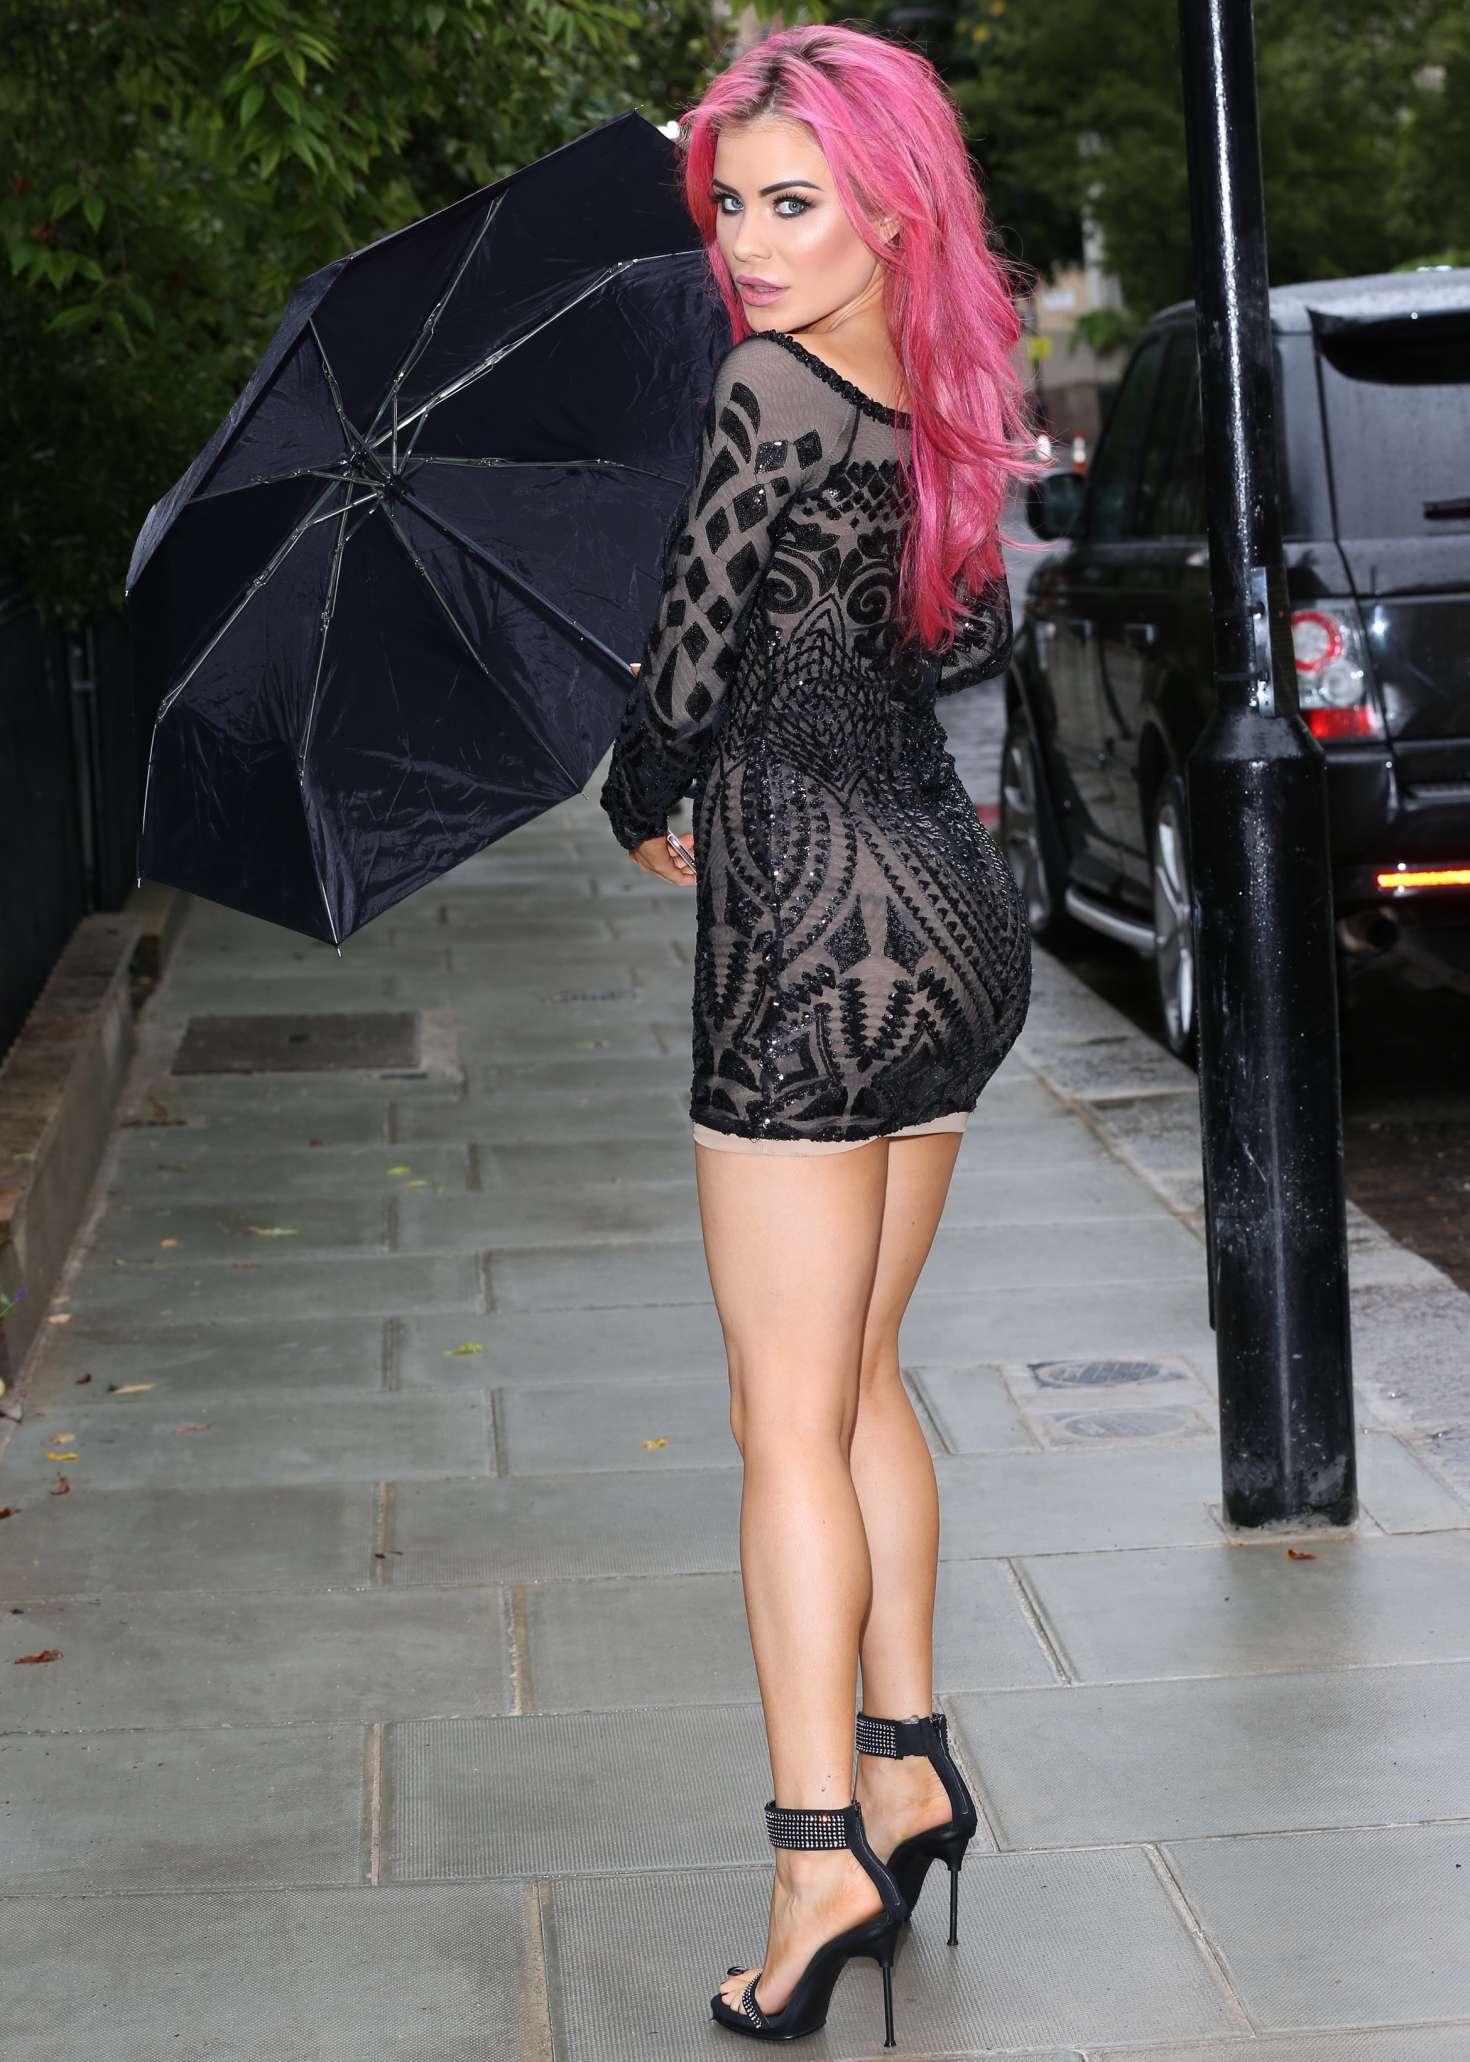 Carla howe in mini dress atomic blonde film event at village underground in london nude (35 pics)